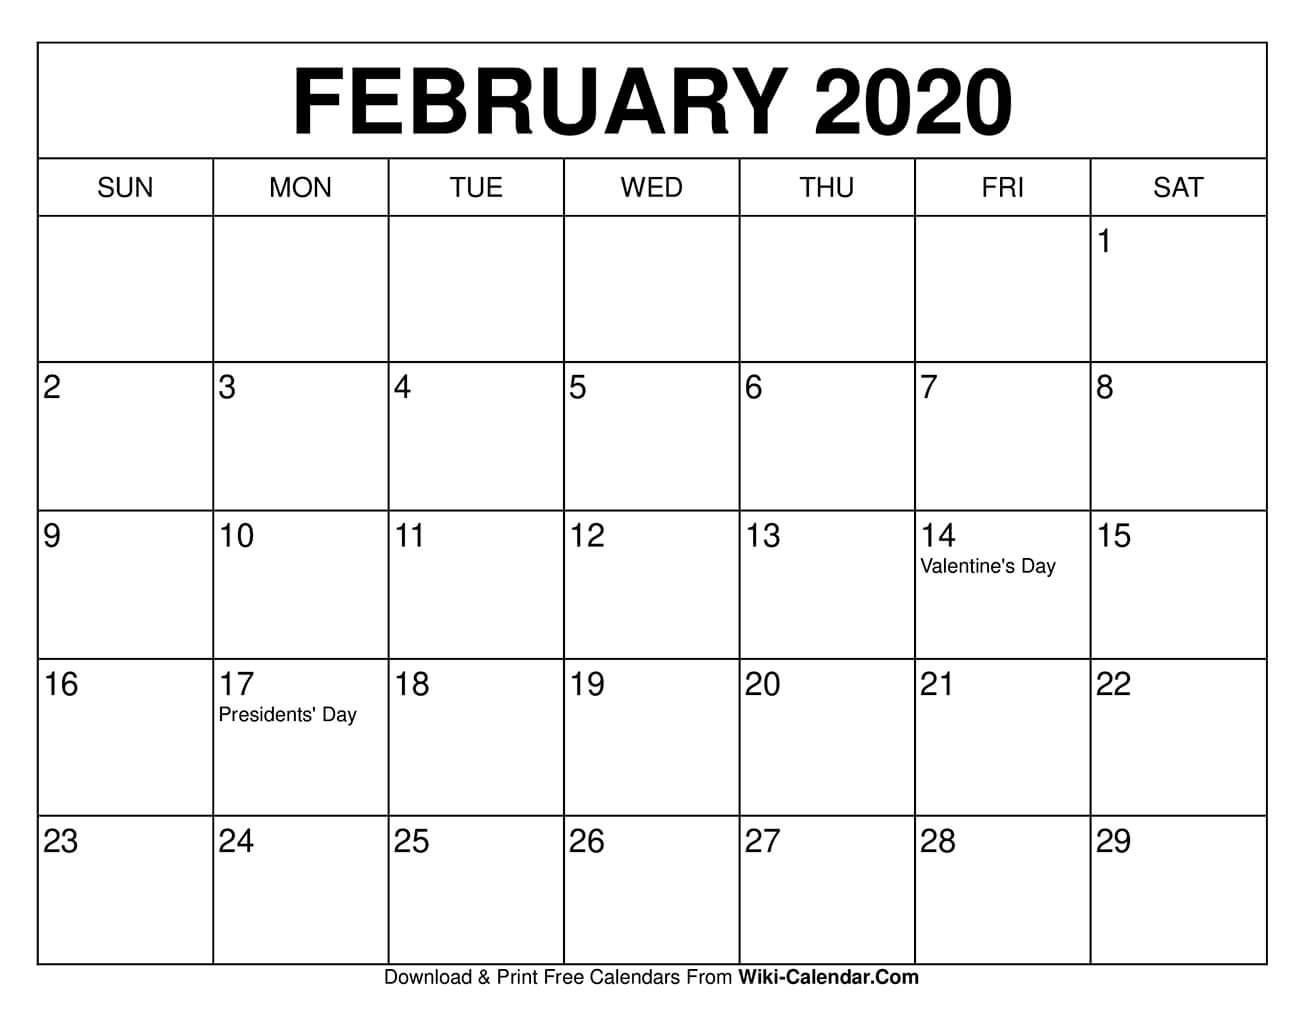 Free Printable February 2020 Calendars  February 2020 Calendar Printable